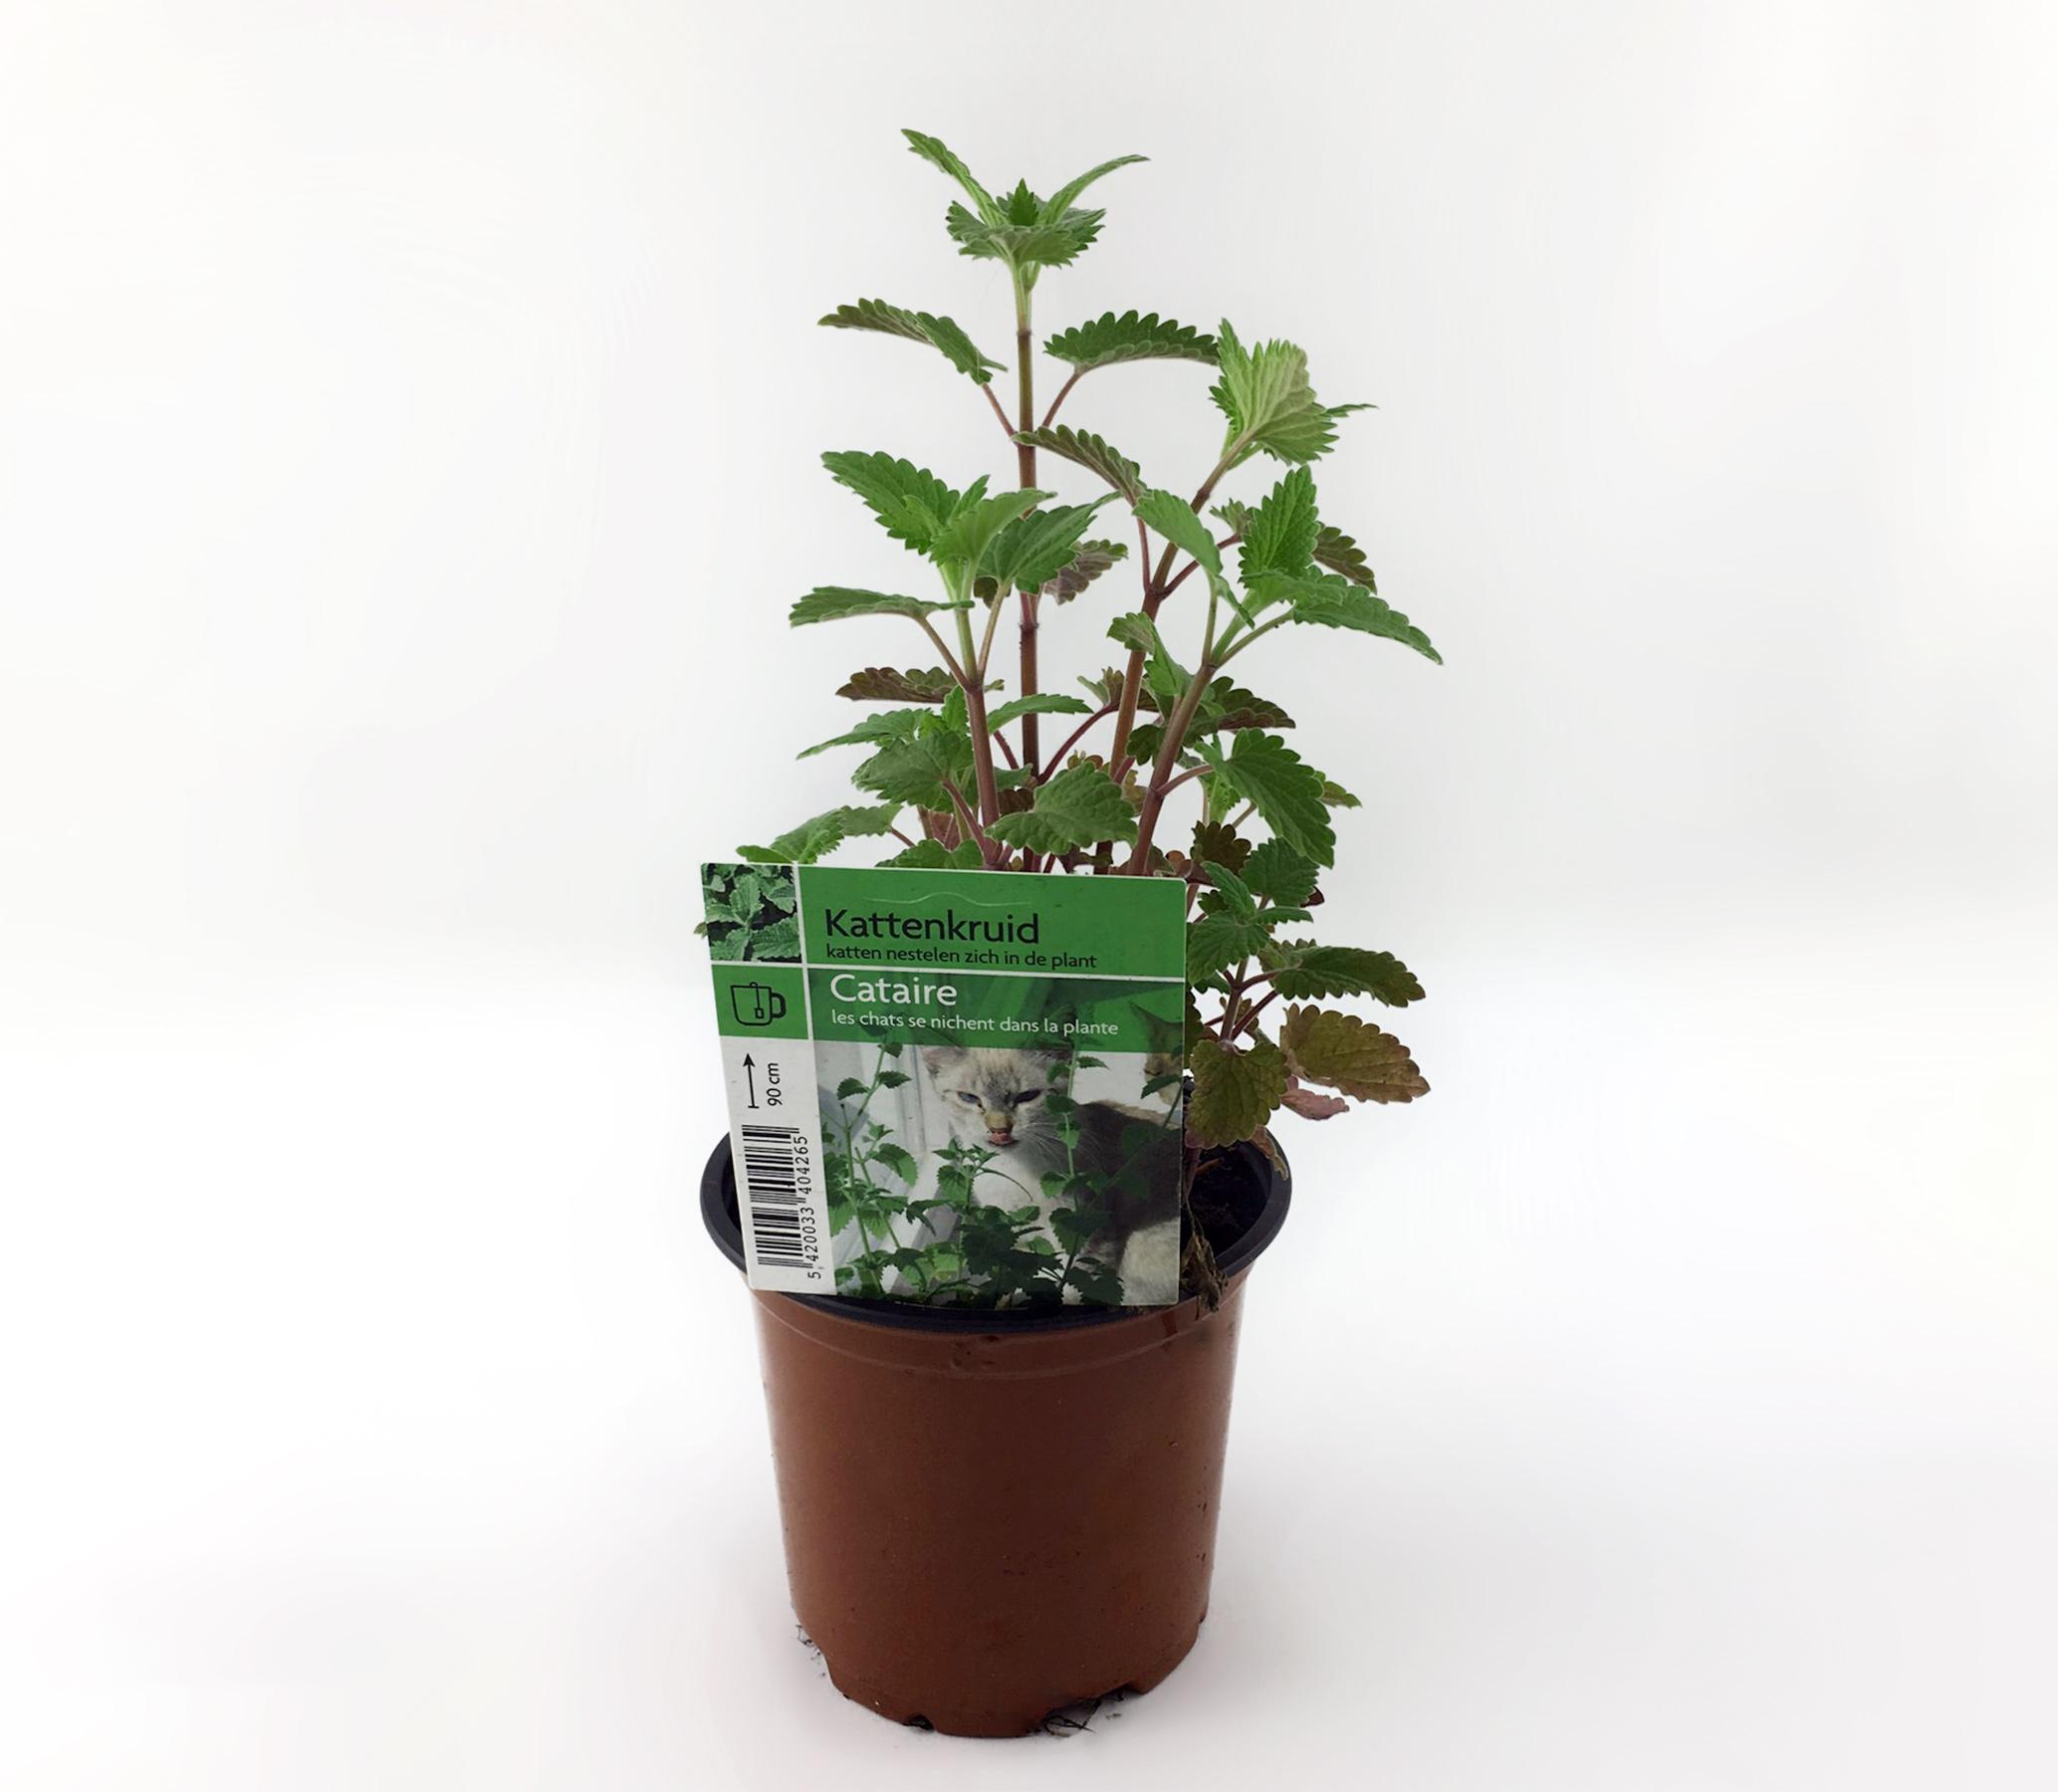 Katžolė vazone (catnip)